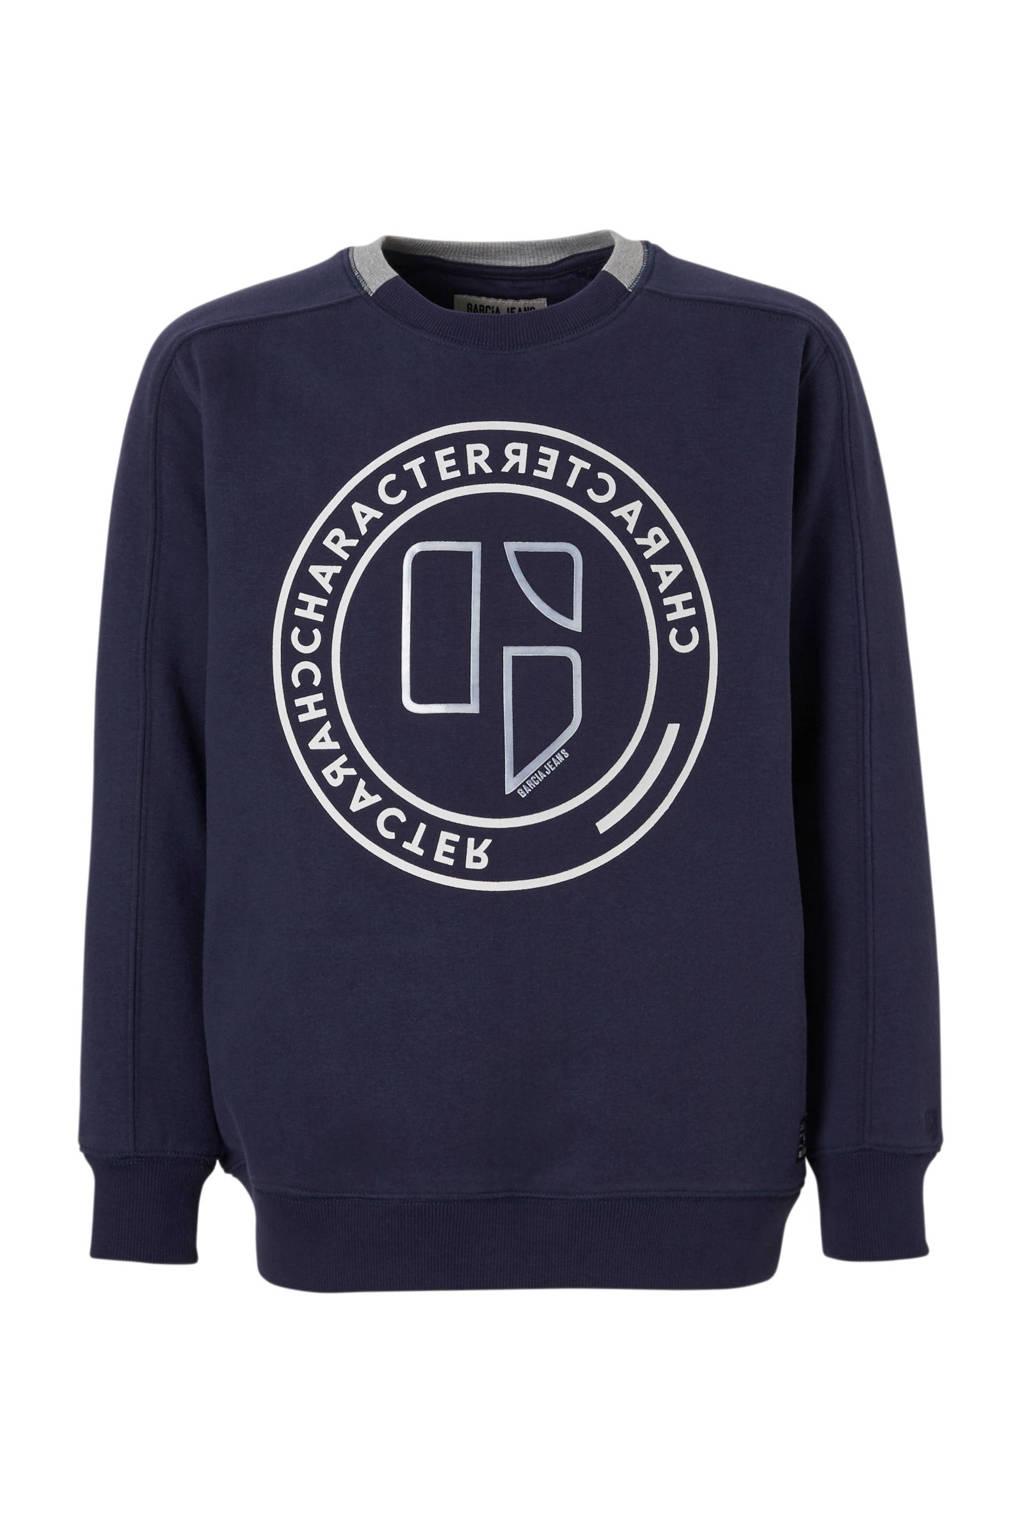 Garcia sweater donkerblauw, Donkerblauw/wit